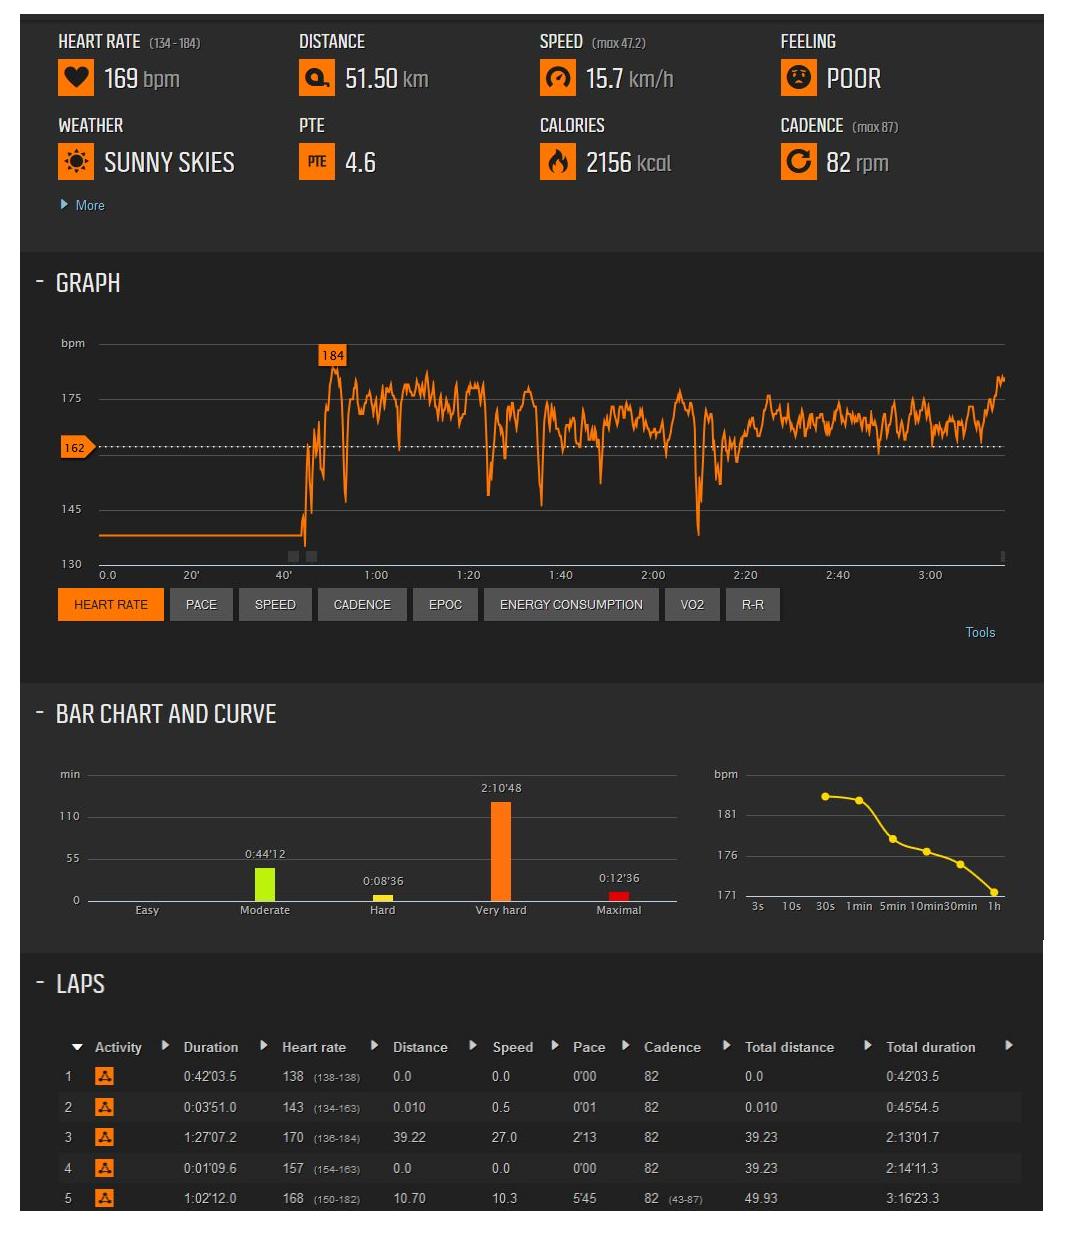 Kinathlon, August 2014 (movescount record)